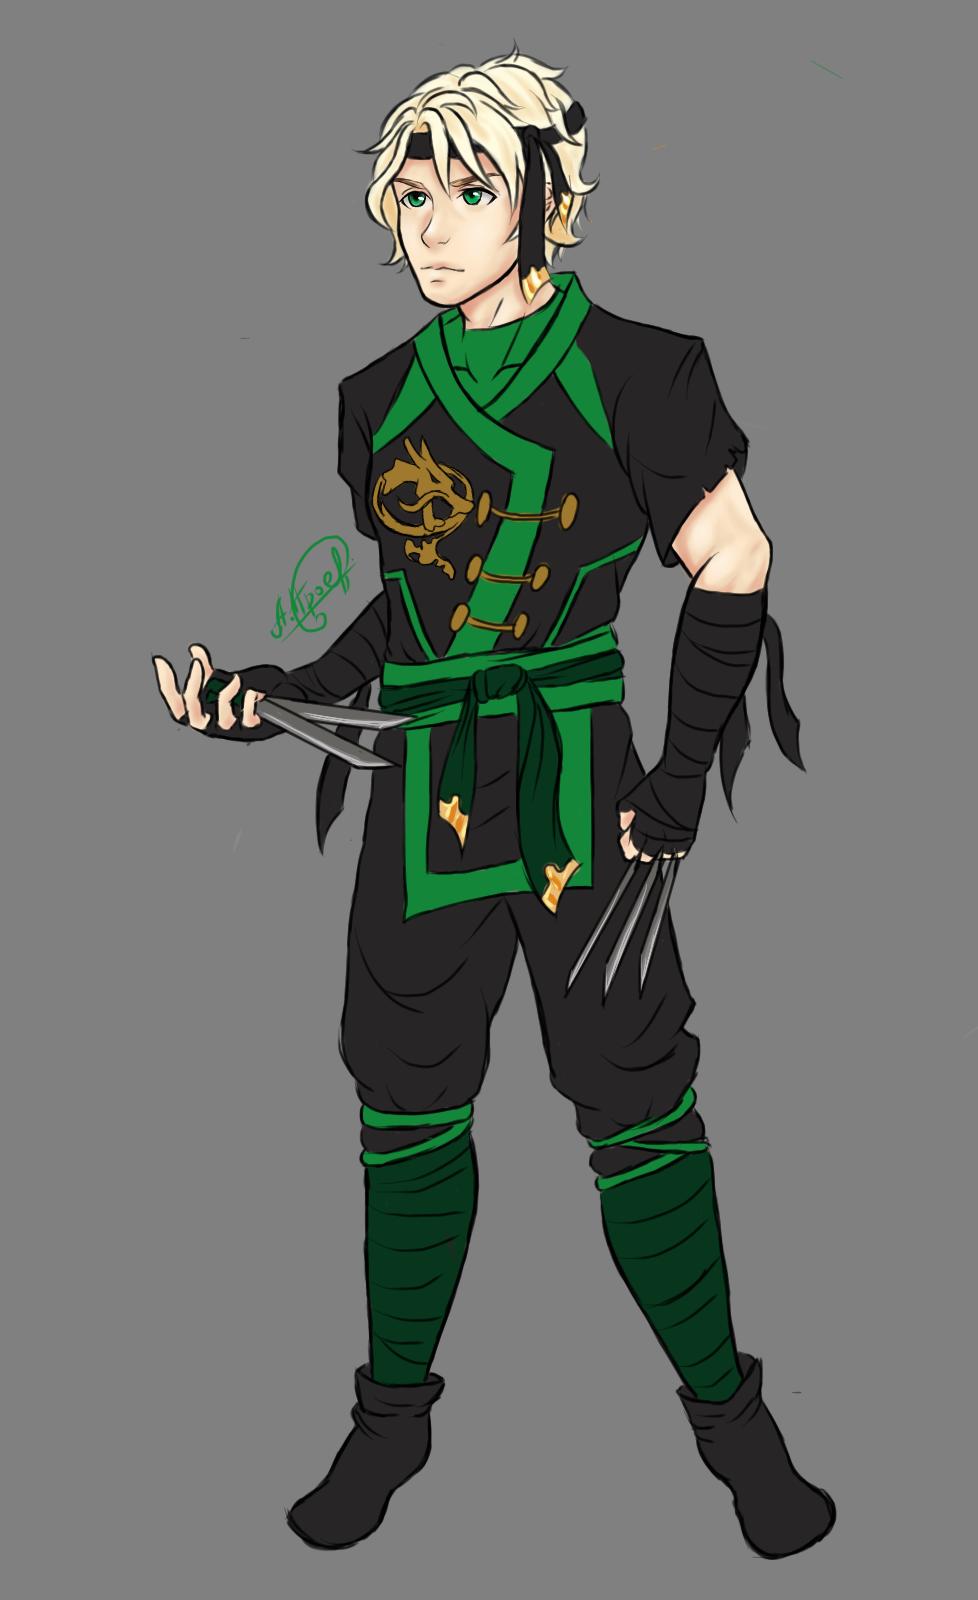 Lloyd in the 6th season by on deviantart ninjago pinterest - Ninjago dessin anime ...